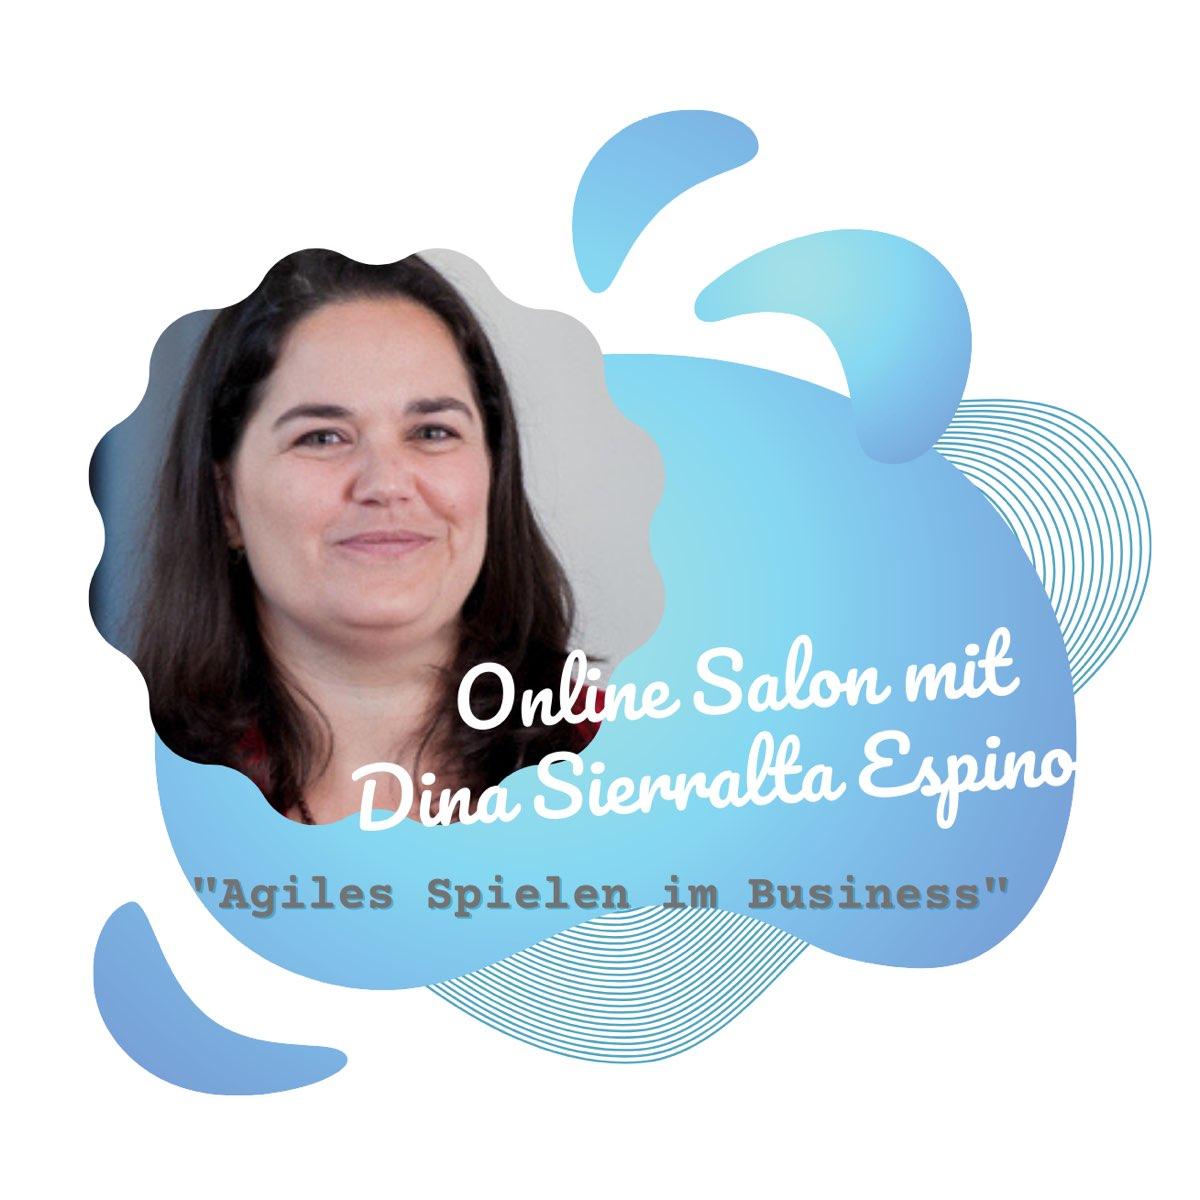 Dina Sierralta: Agiles Spielen im Business